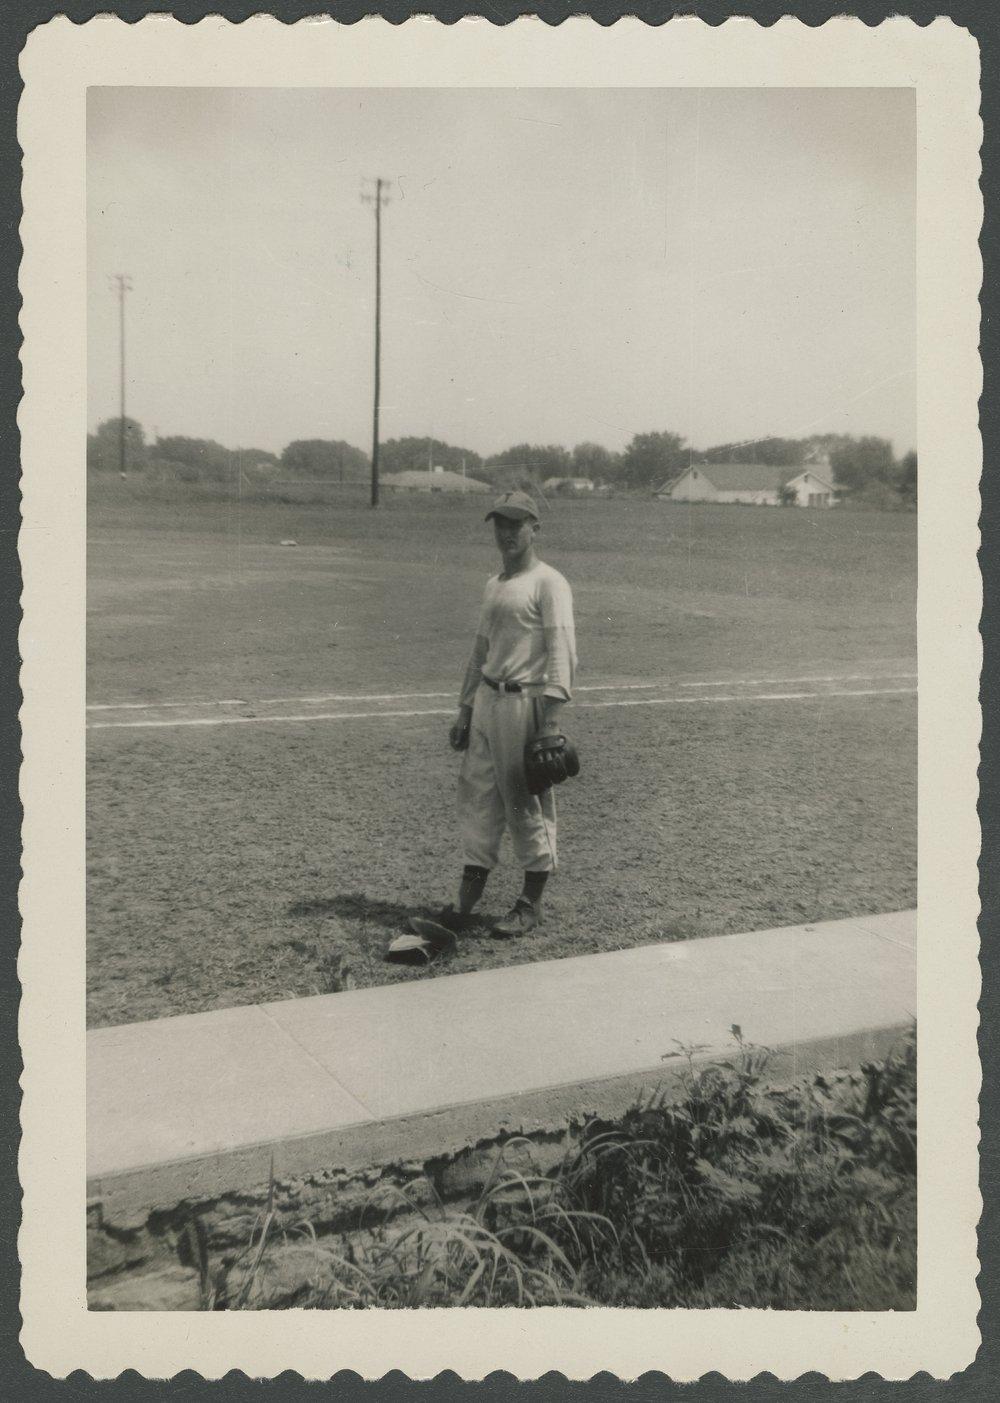 Mosby-Mack baseball team members in Topeka, Kansas - 1